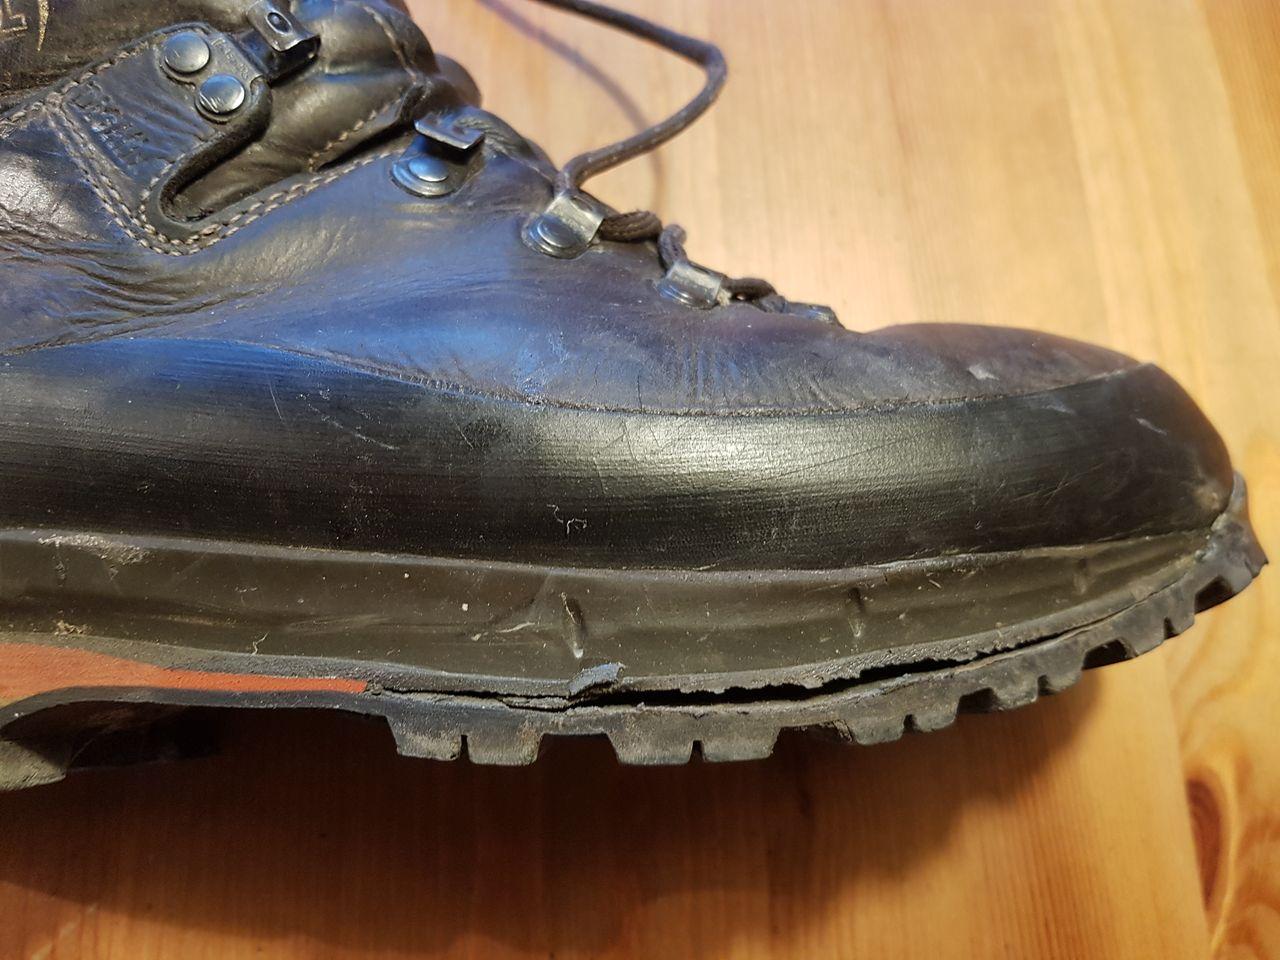 2fbfbfa44529f1 Wanderschuhe – Sohle kaputt – Neue Schuhe kaufen oder reparieren ...